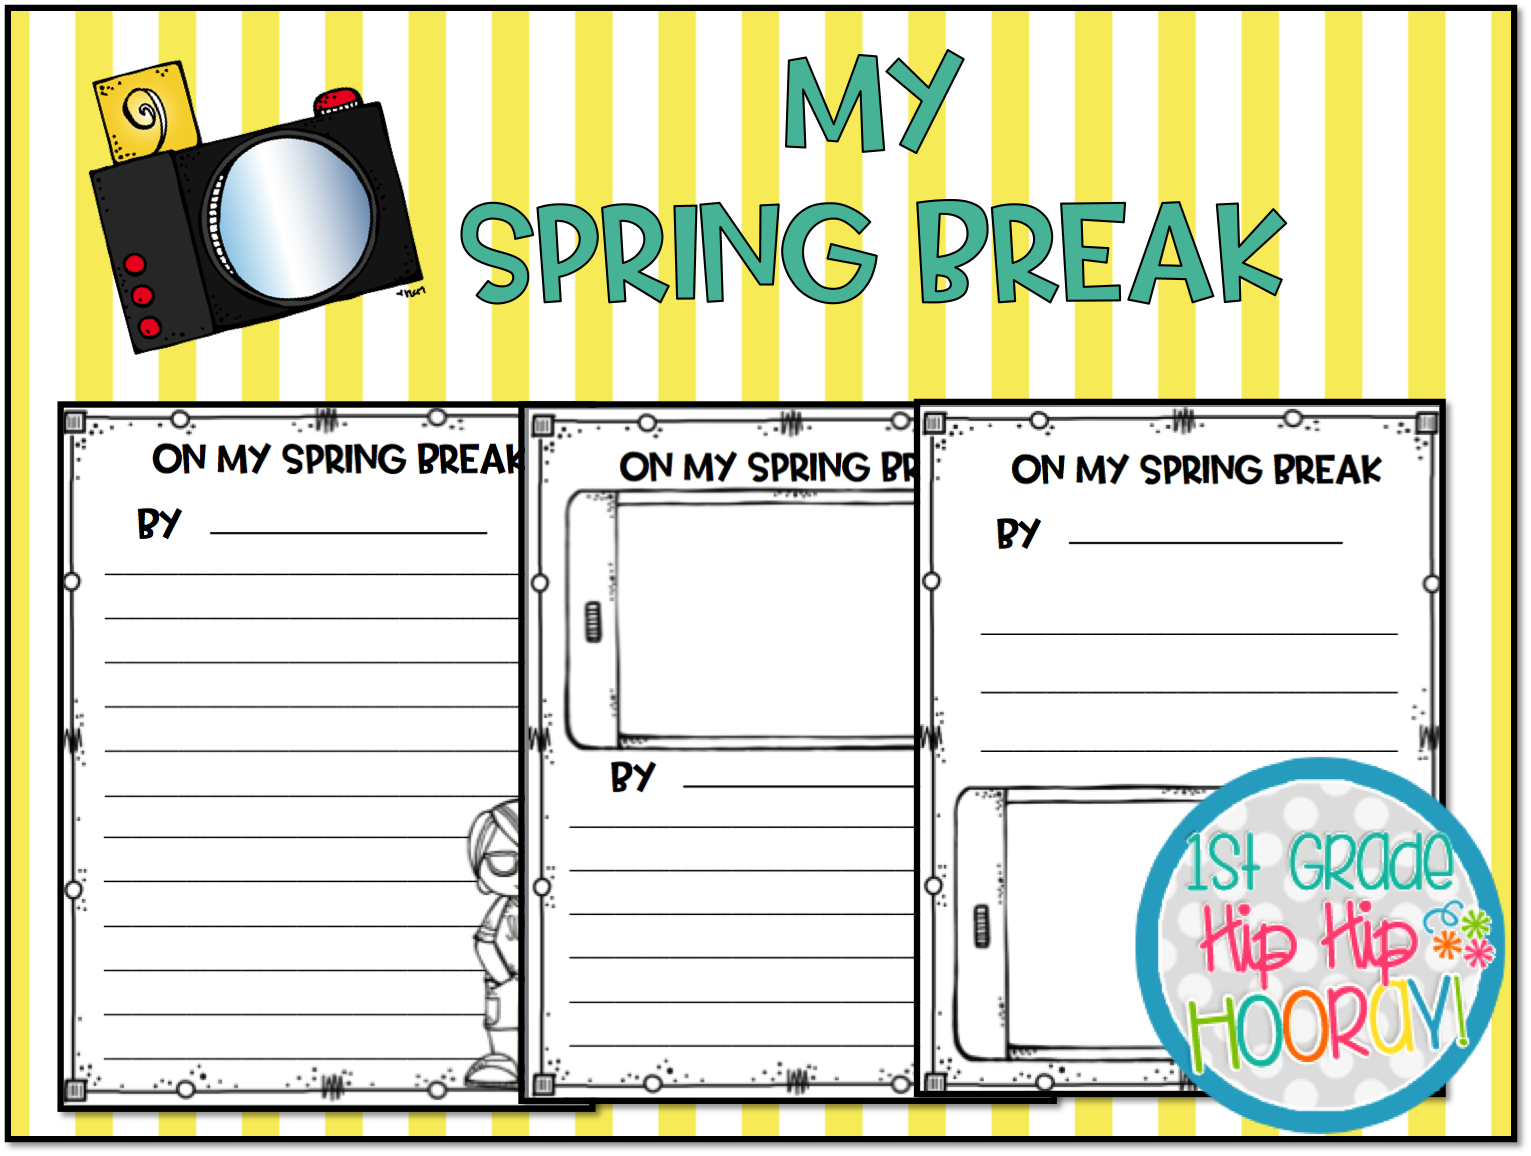 1st Grade Hip Hip Hooray Spring Break Writing And